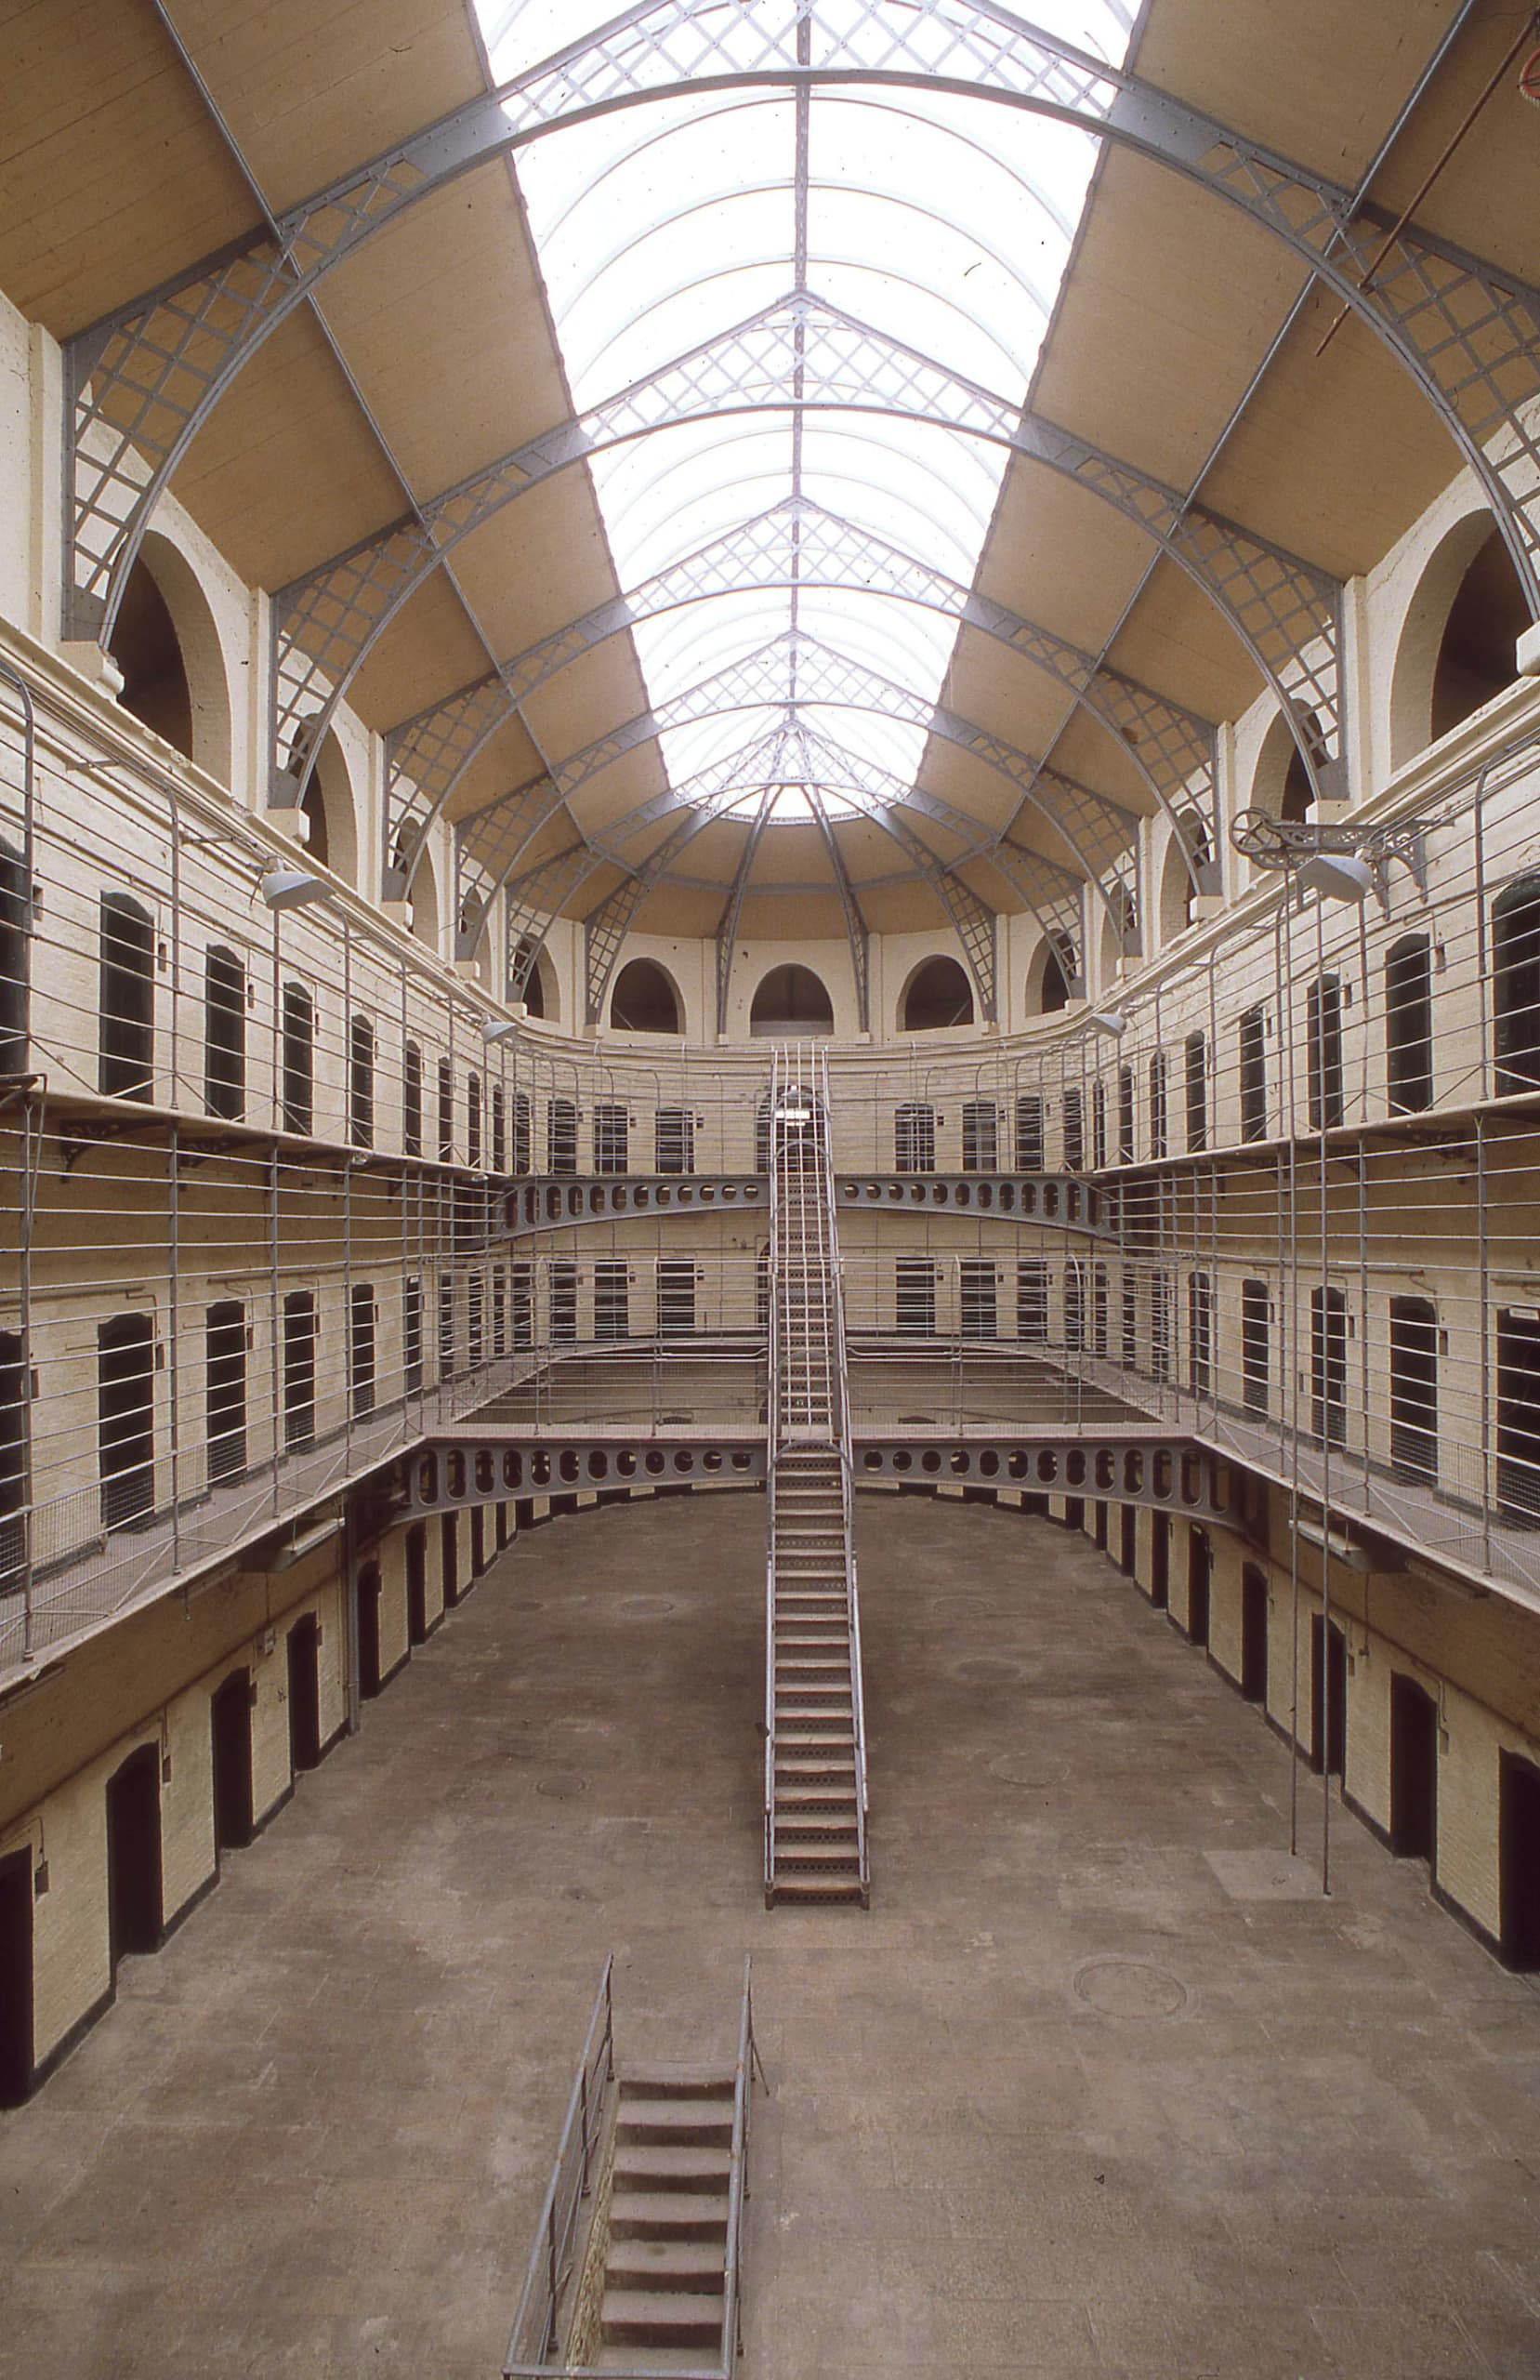 Zellen des Kilmainham Gaol Gefängnis' in Dublin